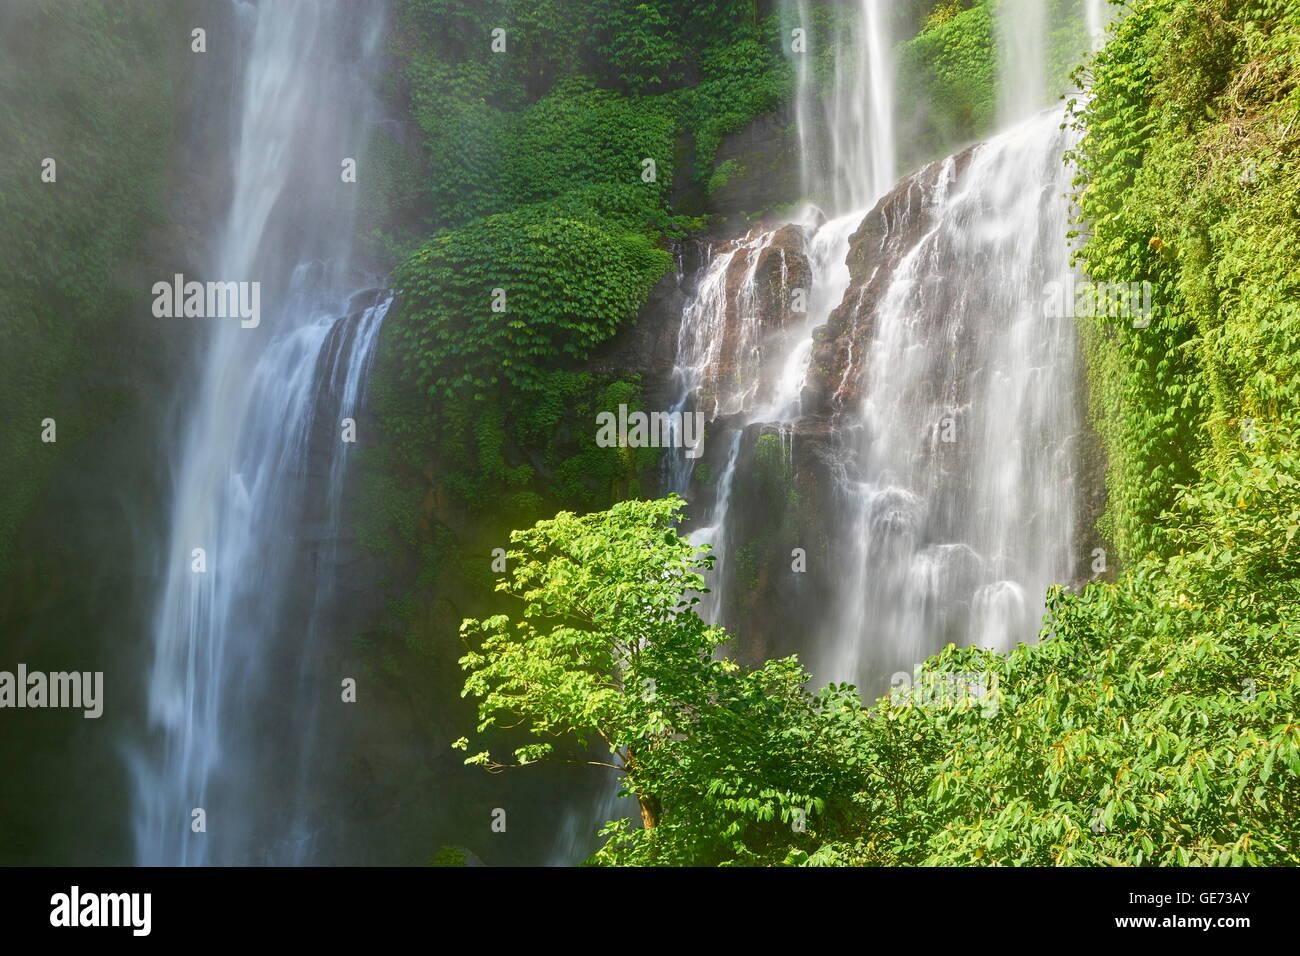 Bali, Indonesia - Sekumpul Waterfall - Stock Image